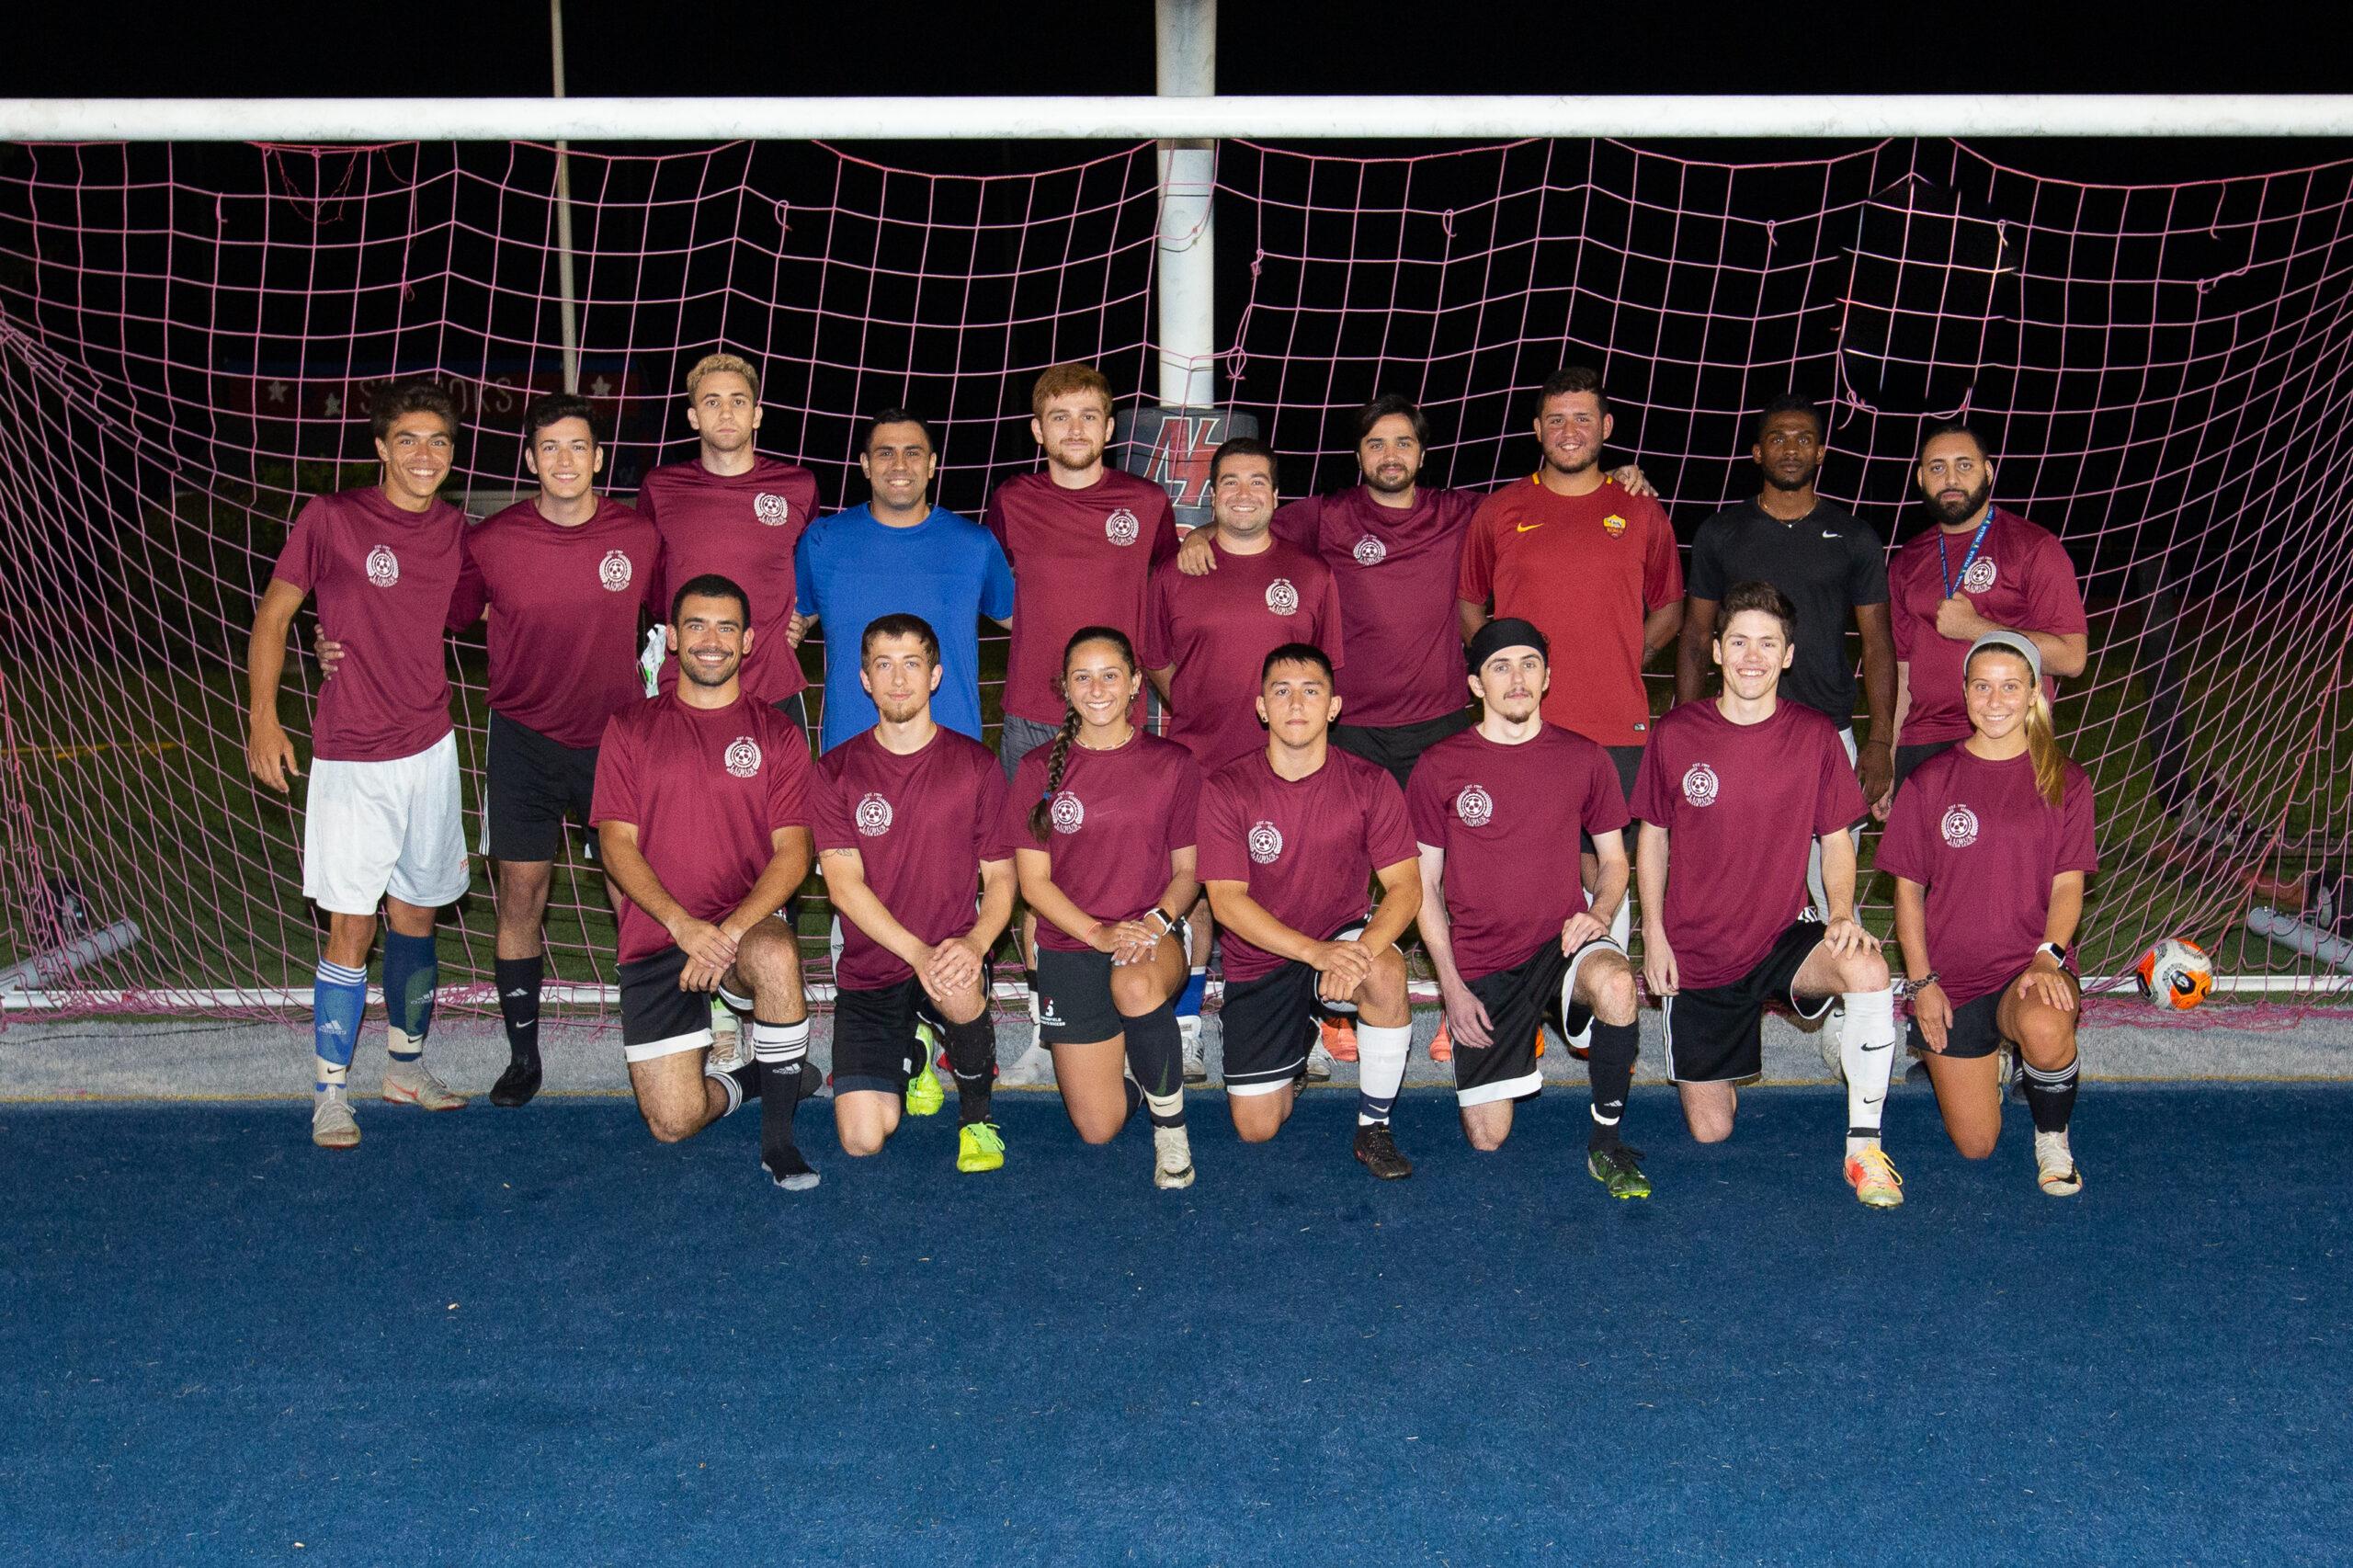 Kauli FC - Lubus Soccer - CT Adult Soccer League